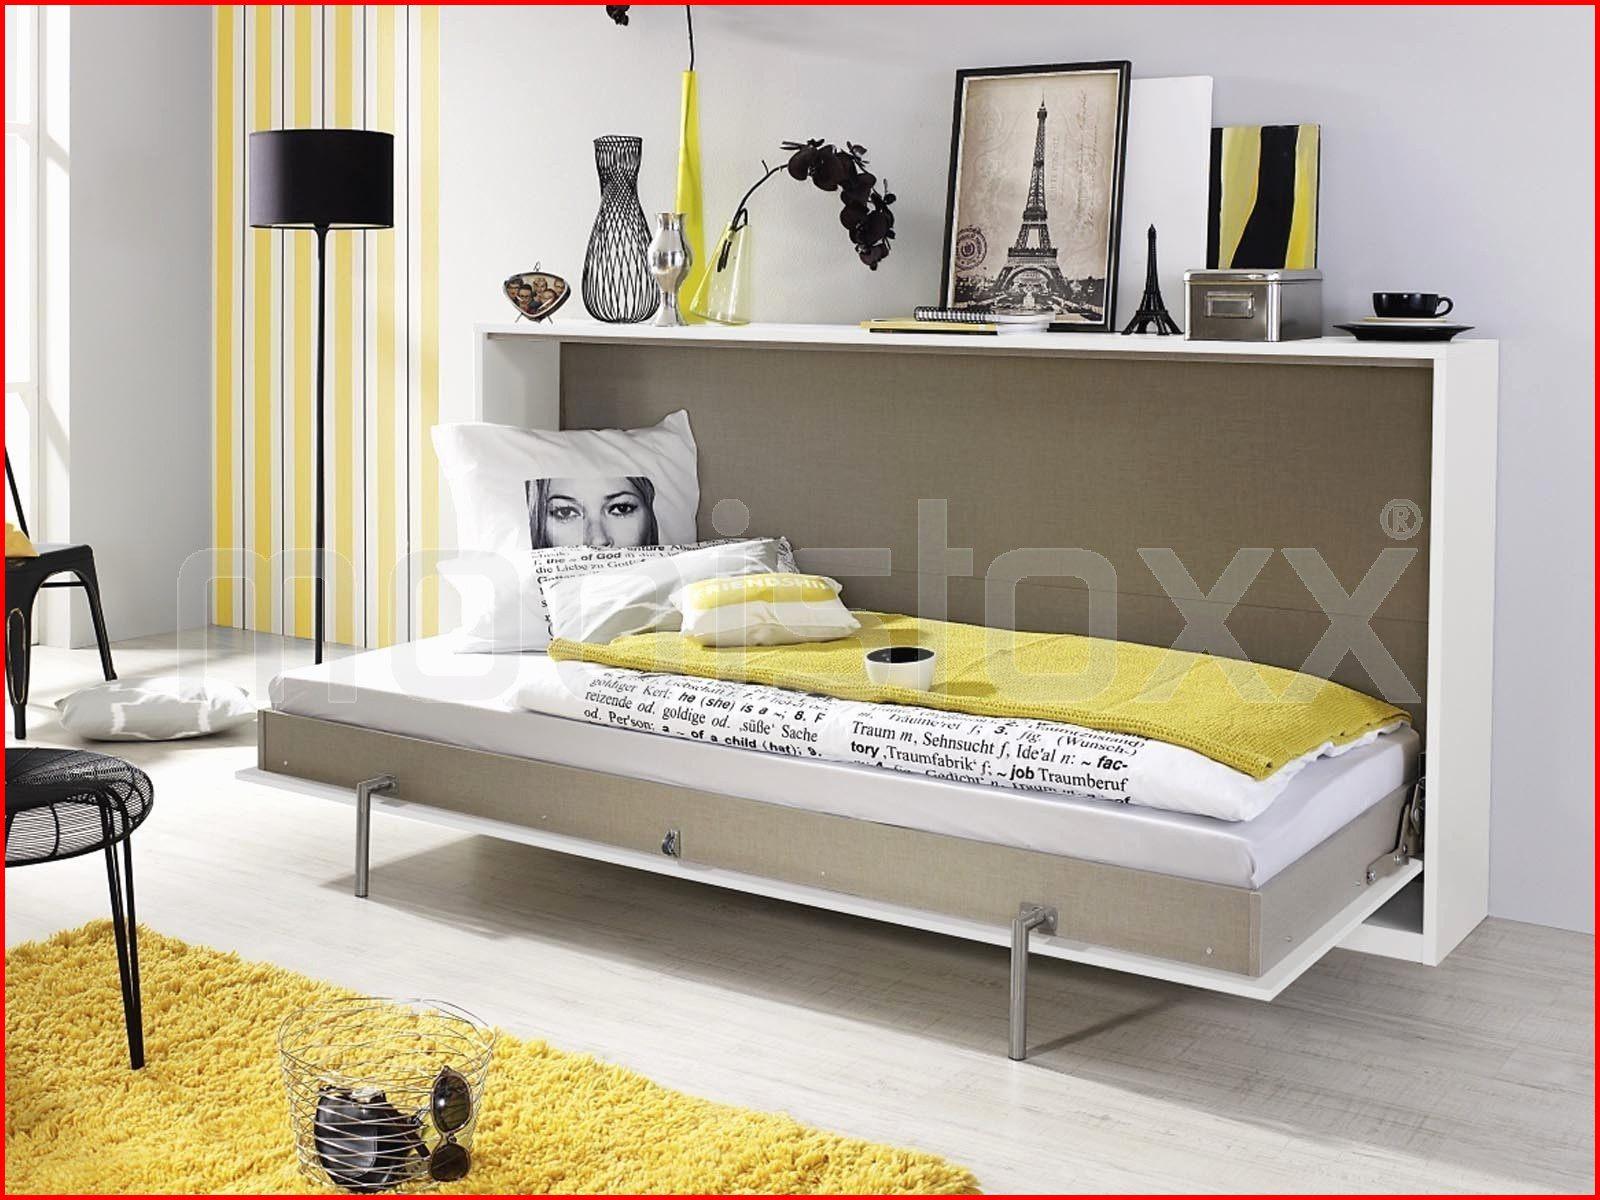 Lit Mezzanine Evolutif Meilleur De Belle Ikea Chambre Ado Lit Mezzanine Sur Lit Mezzanine 0 Lit